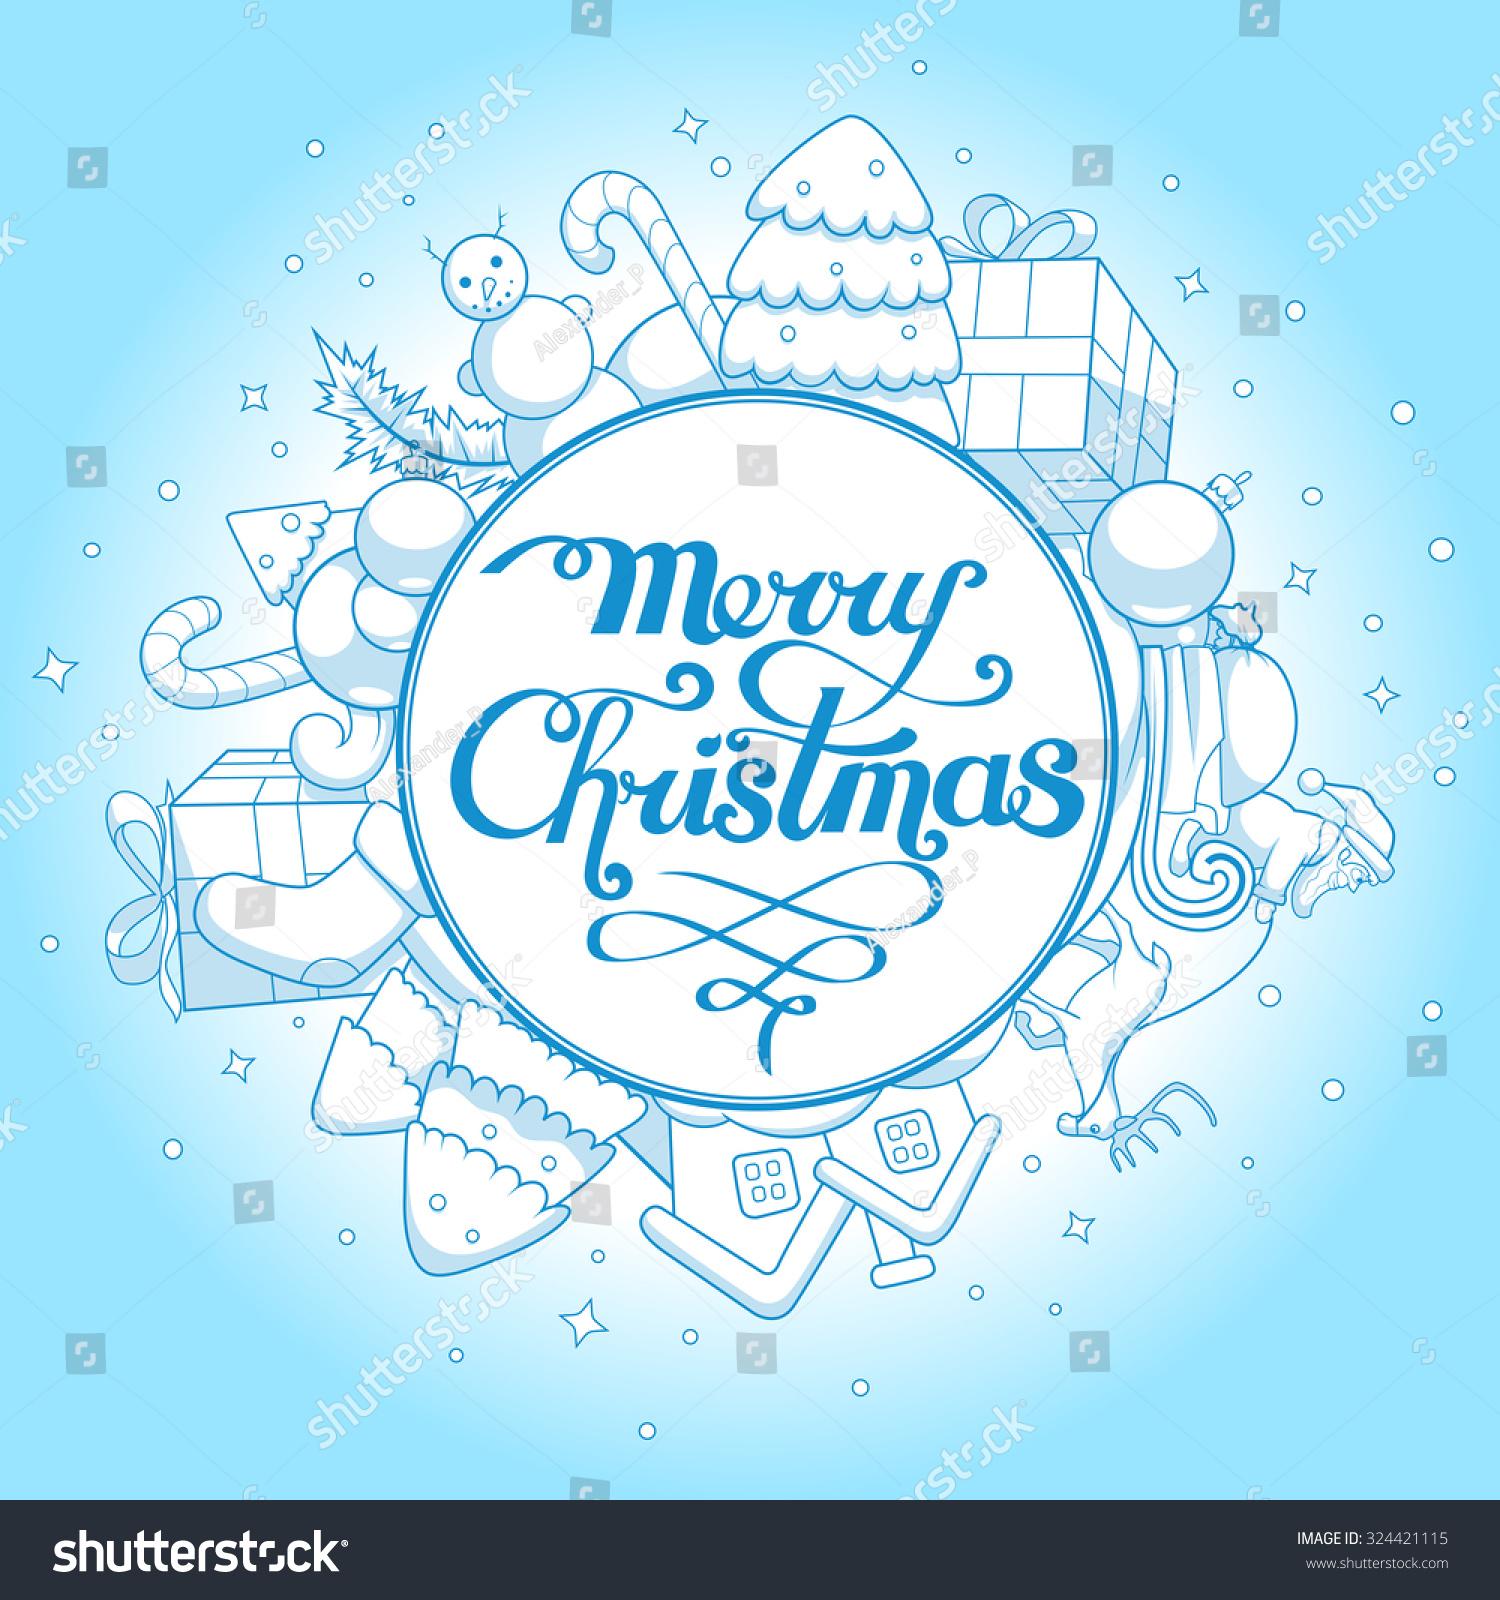 Vector Illustration Christmas Greeting Card Christmas Stock Vector